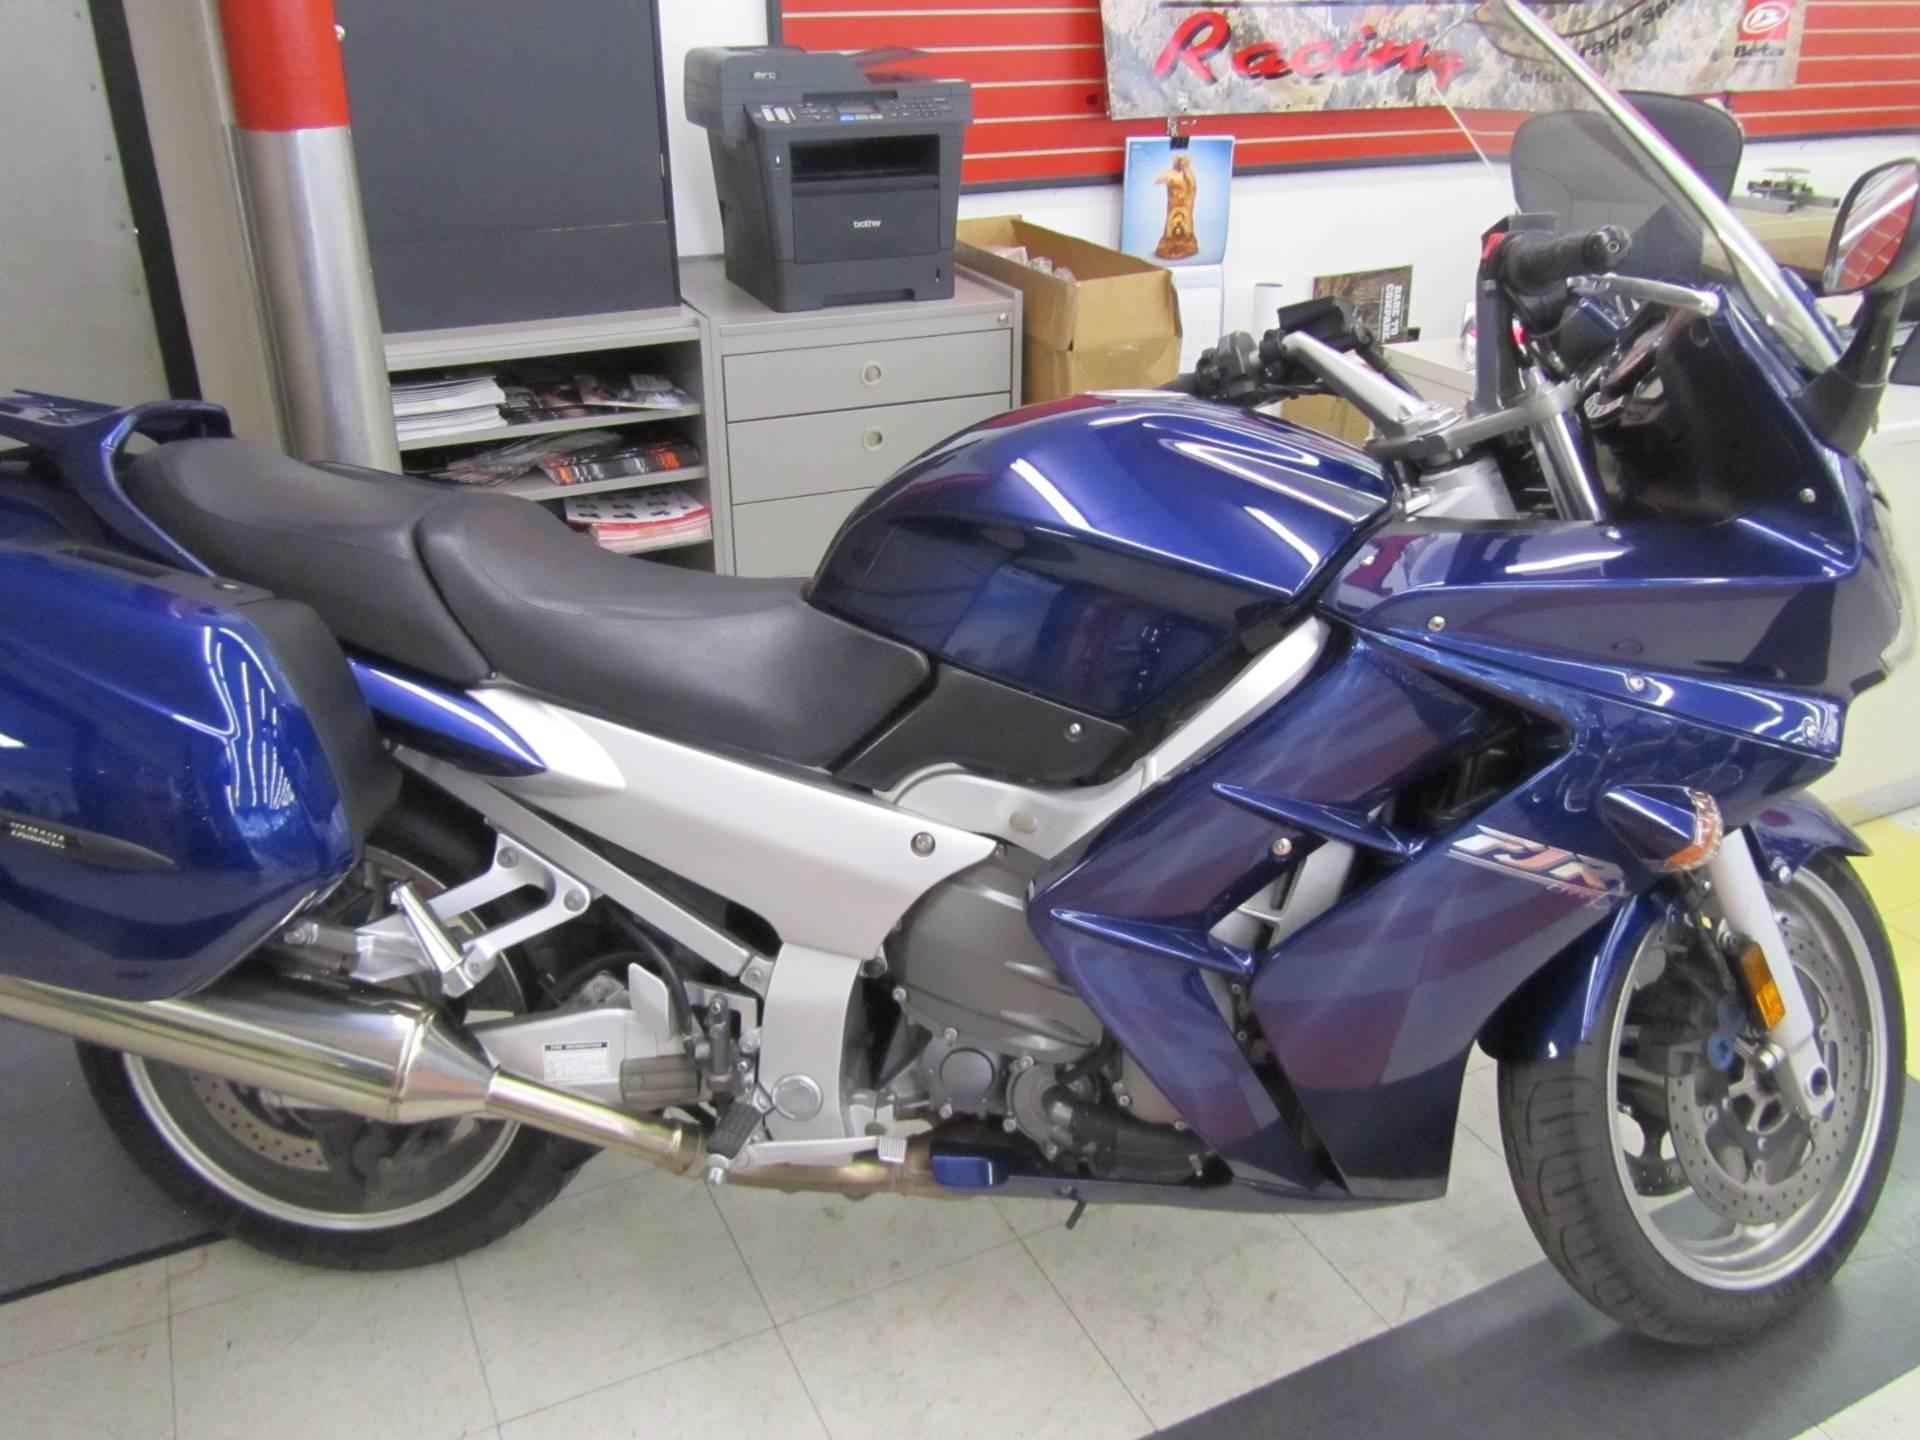 2005 Yamaha FJR 1300A 5